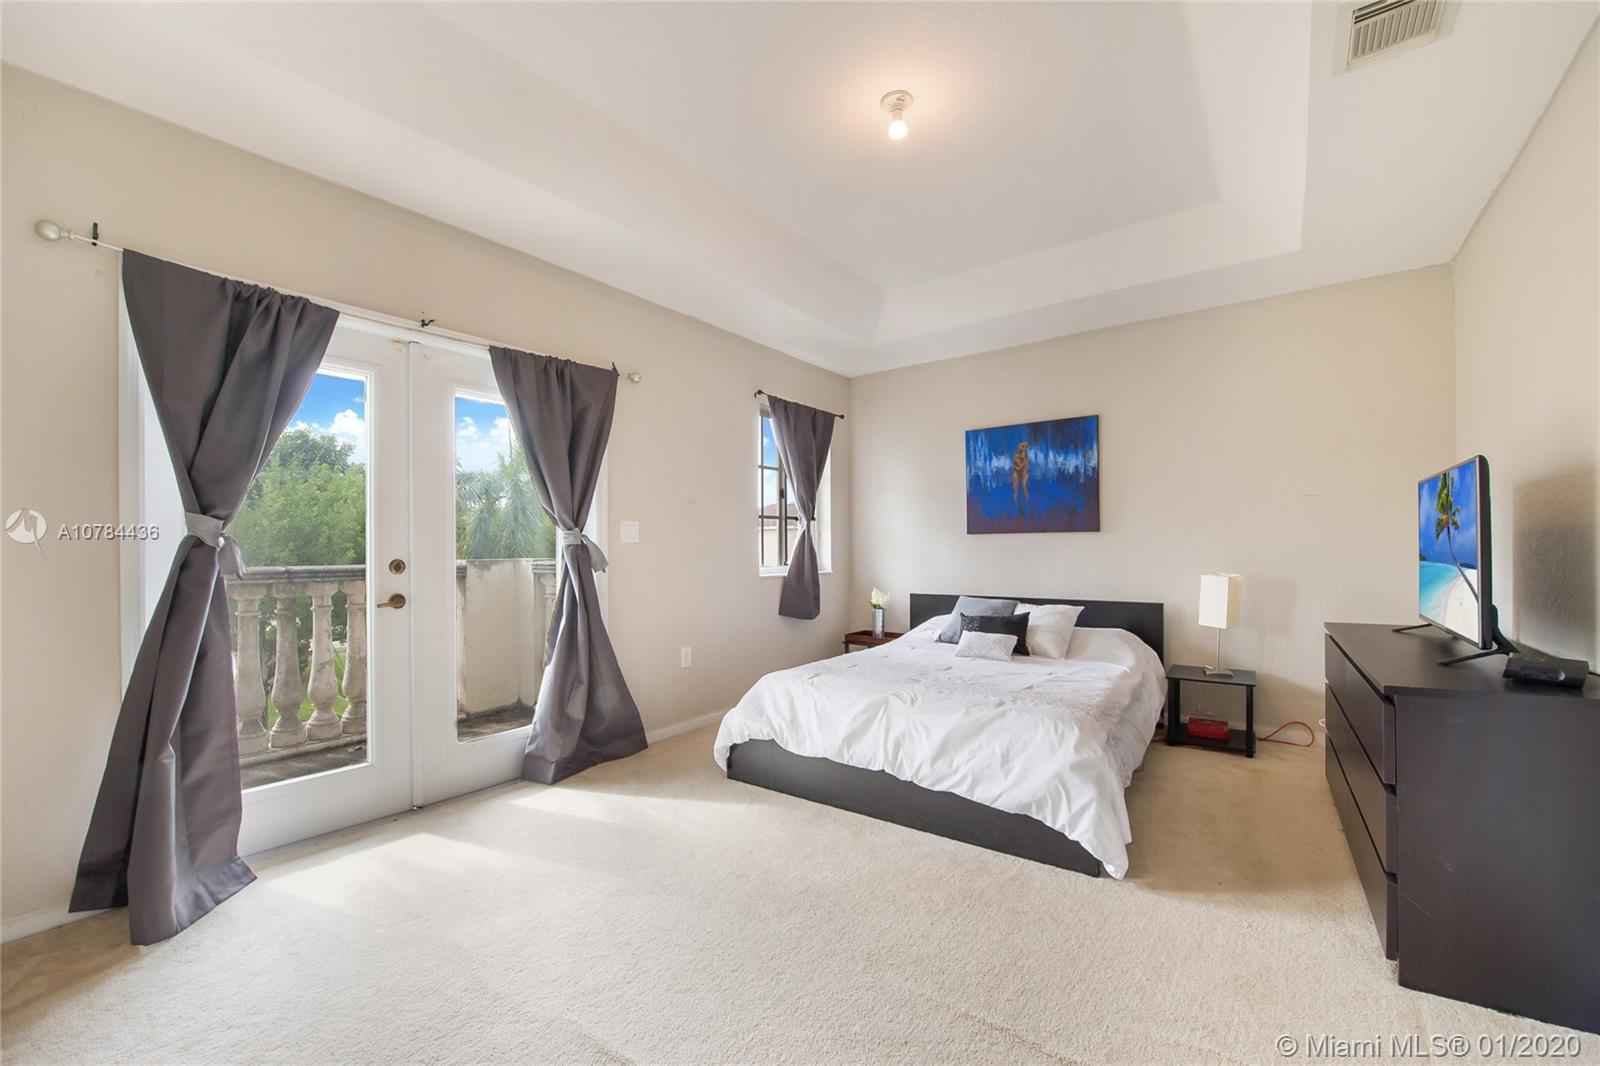 14227 SW 272nd Ln, Homestead, FL 33032 - Homestead, FL real estate listing